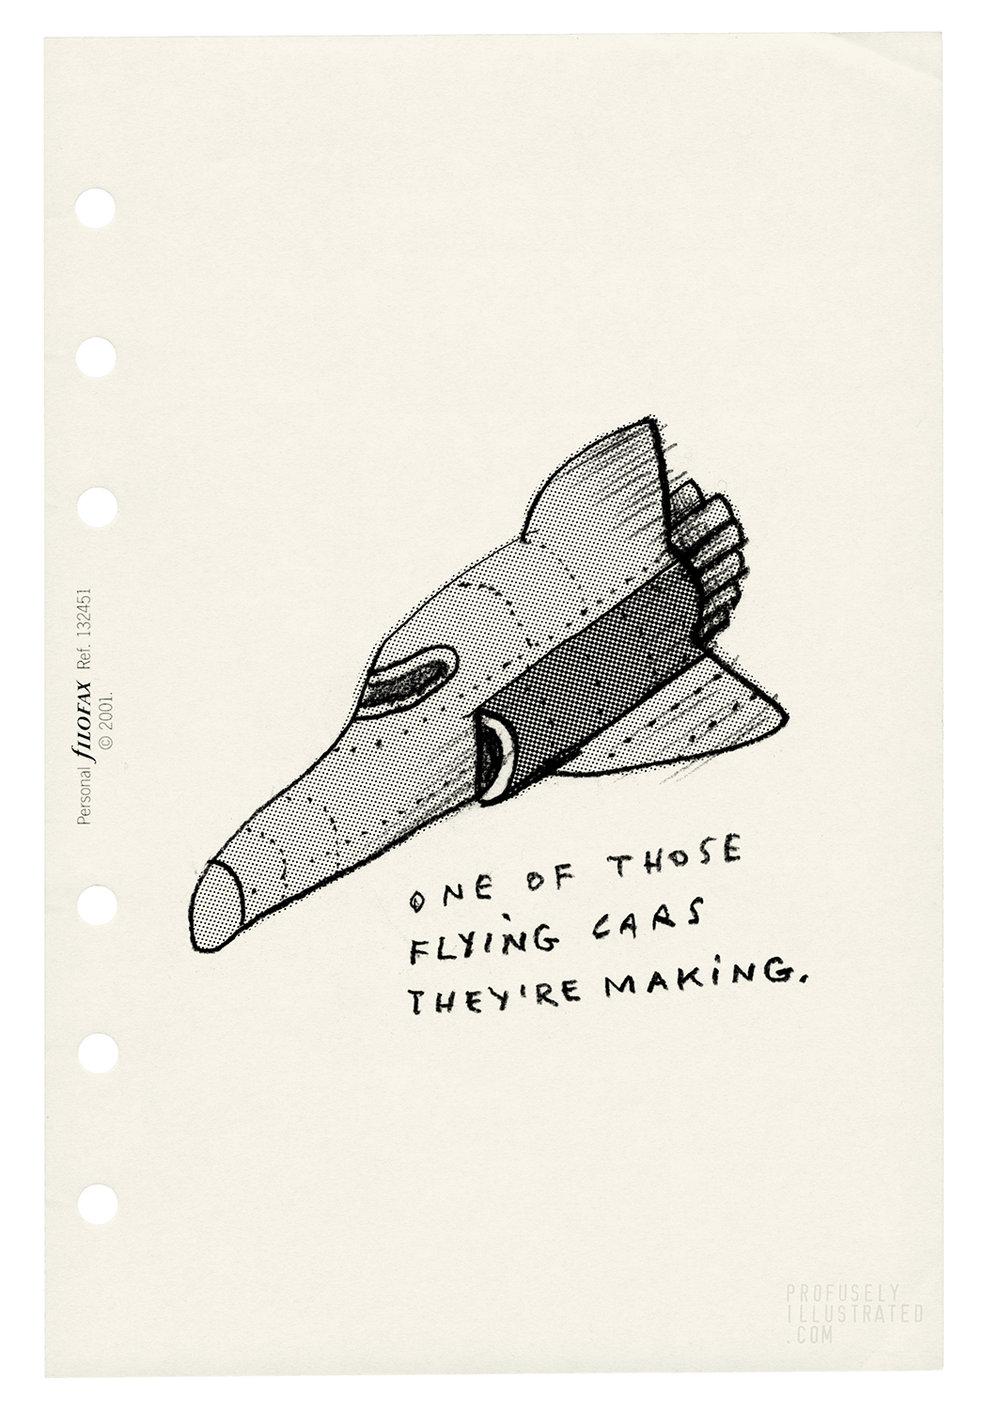 note to self #131 david mackintosh